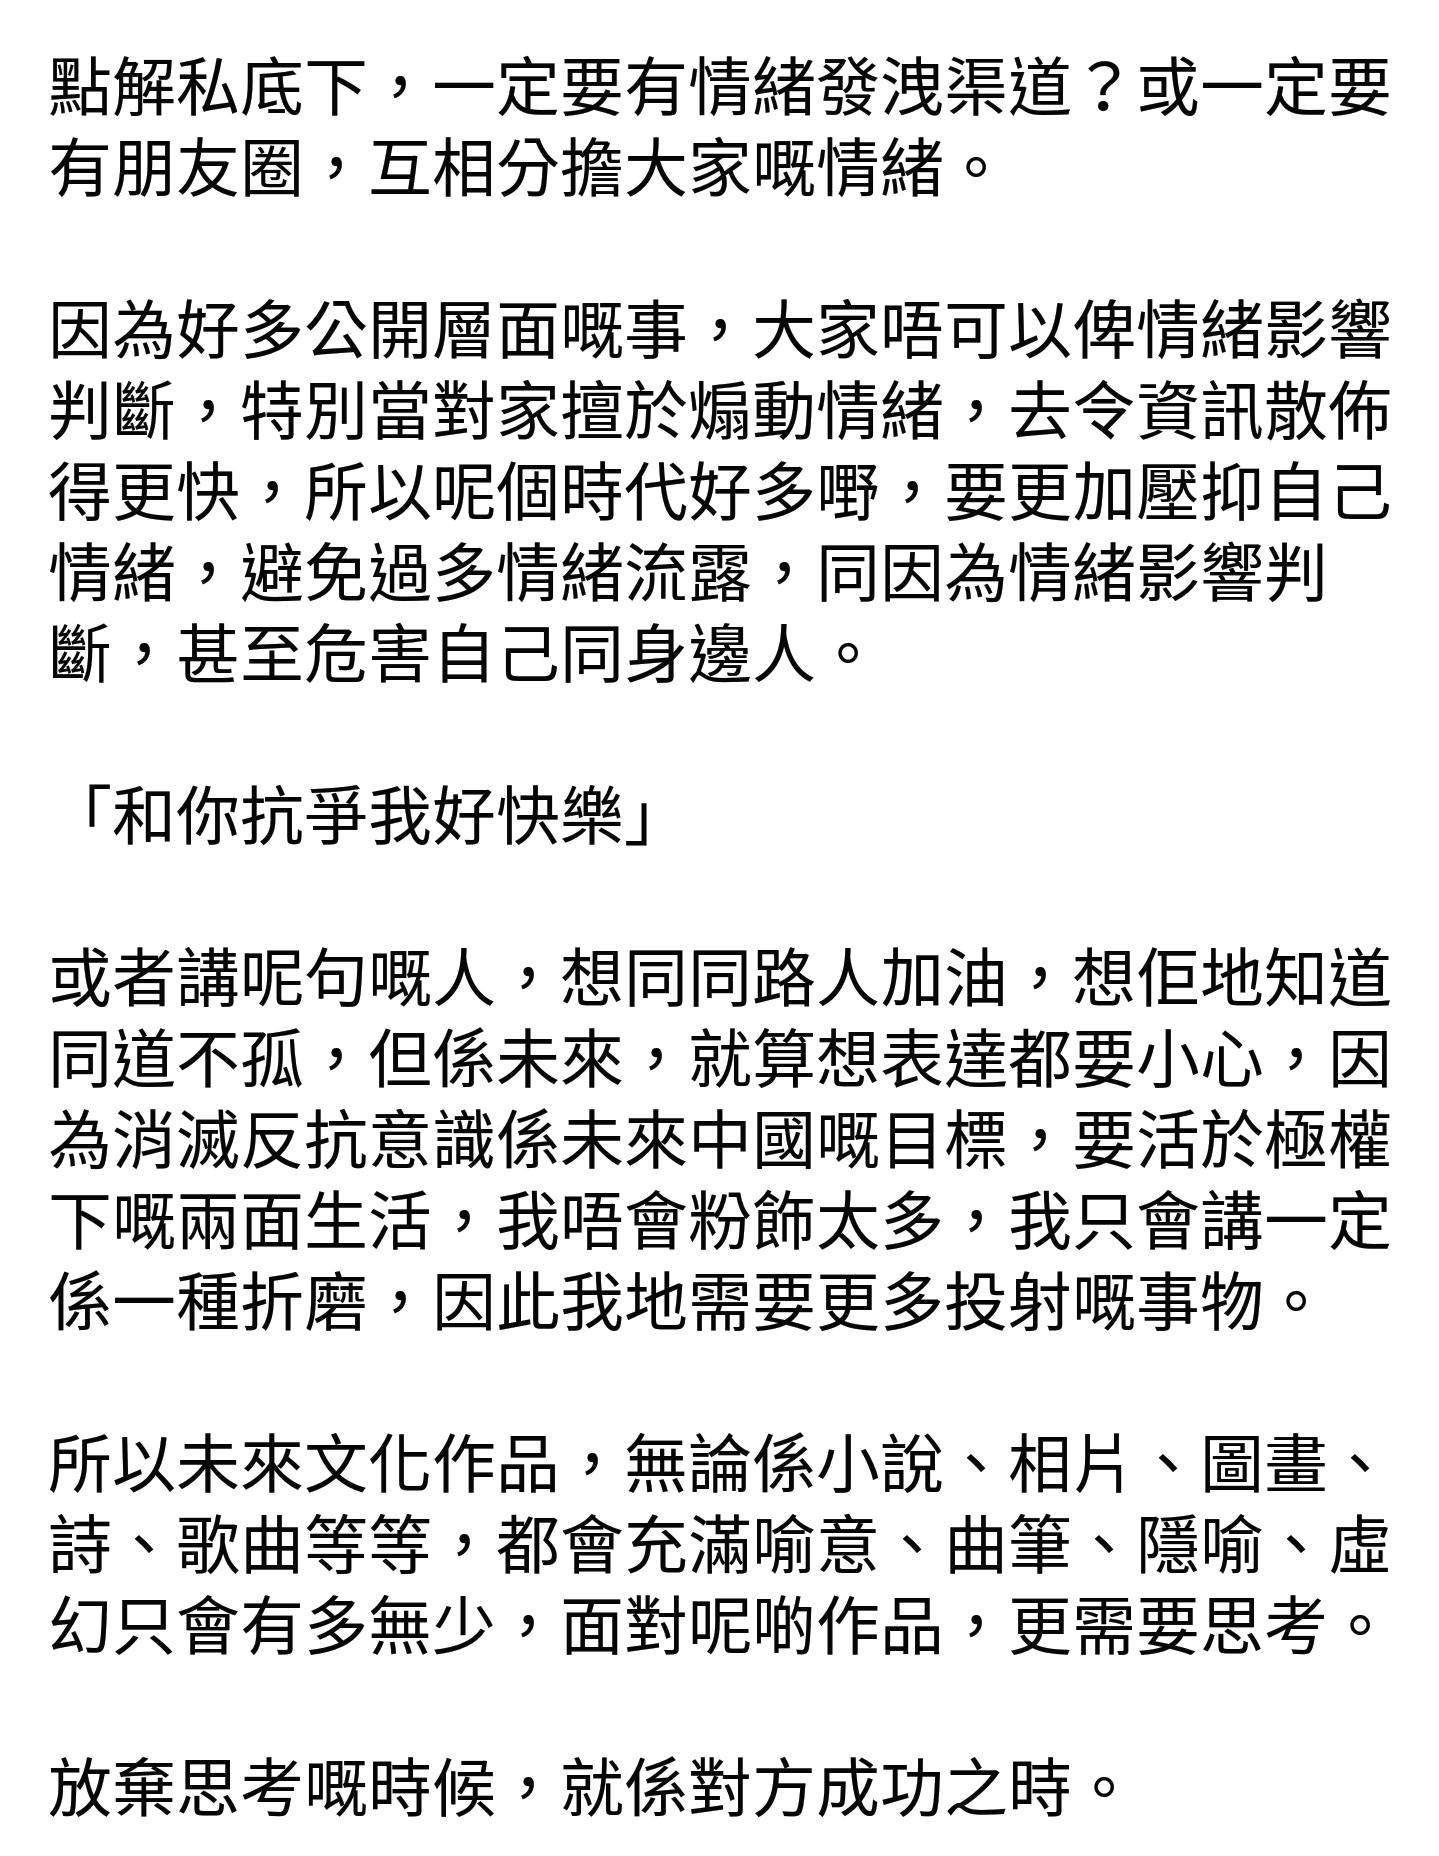 https://upload.cc/i1/2020/07/02/Y0QELh.png